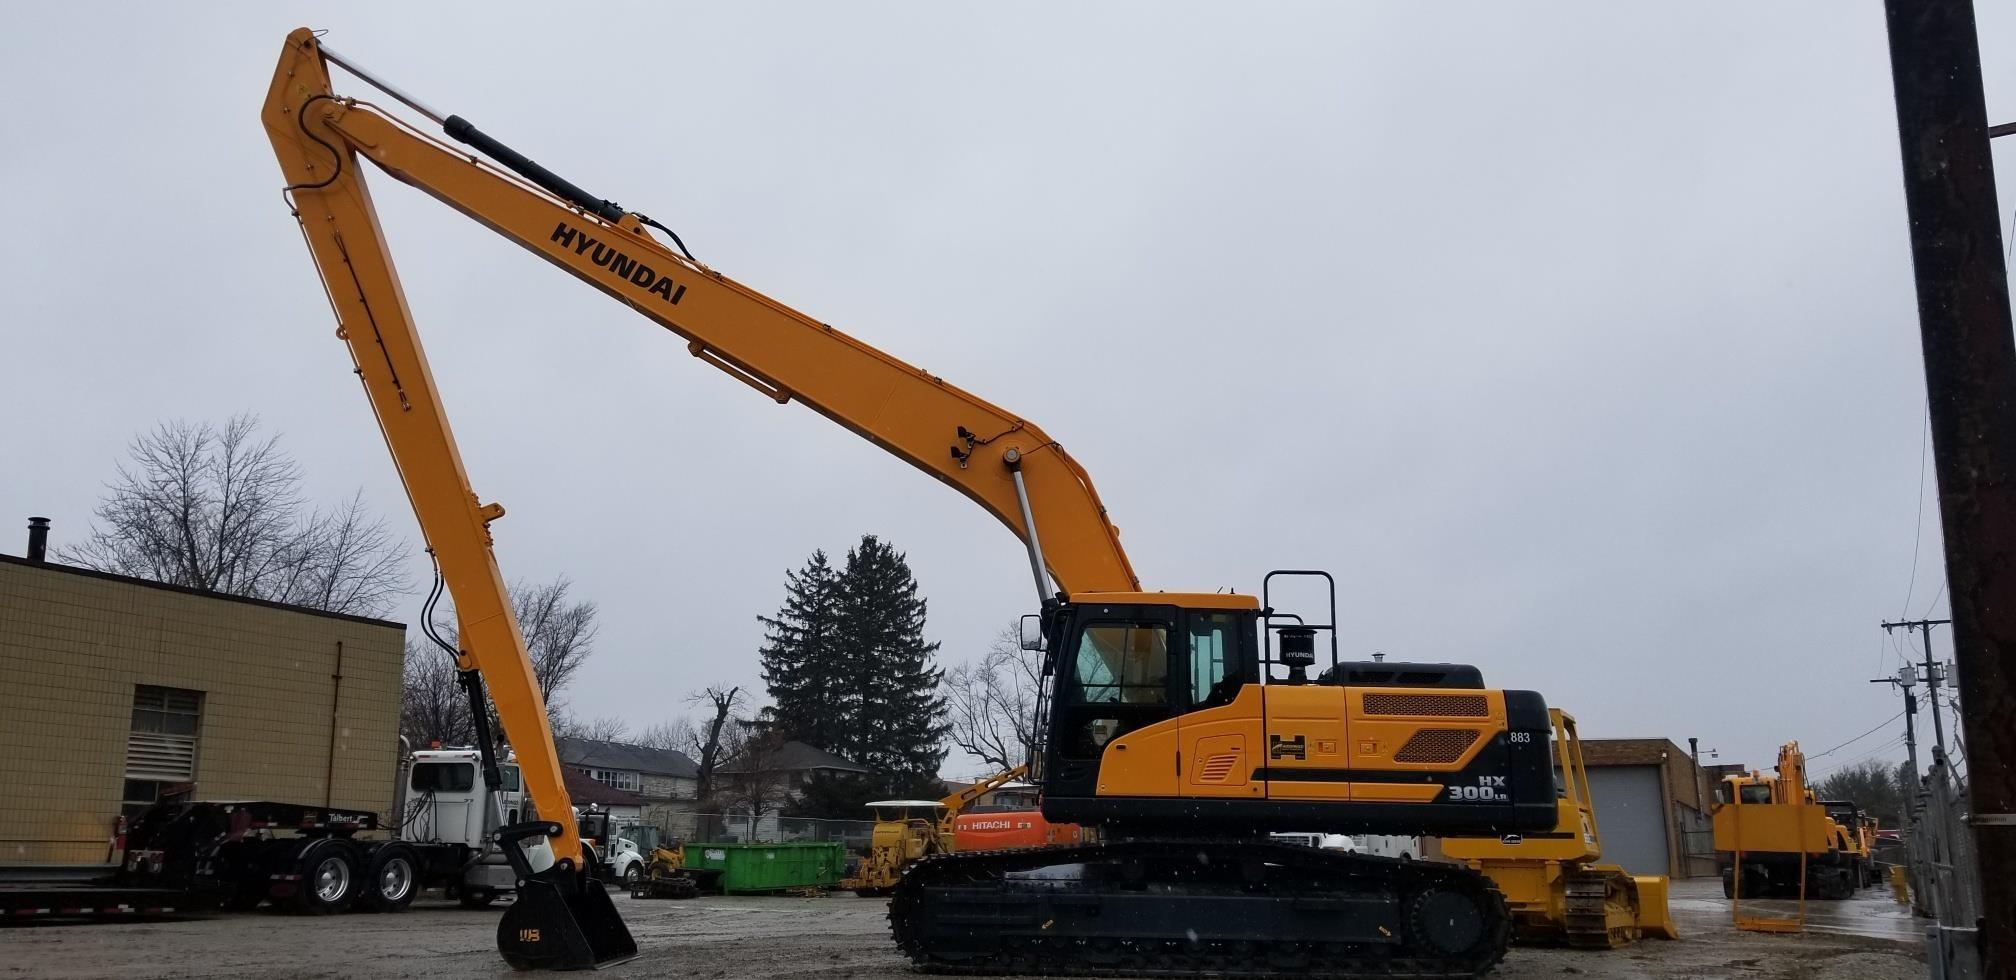 New, 2019, HYUNDAI, HX300 LR, Excavators - Crawler